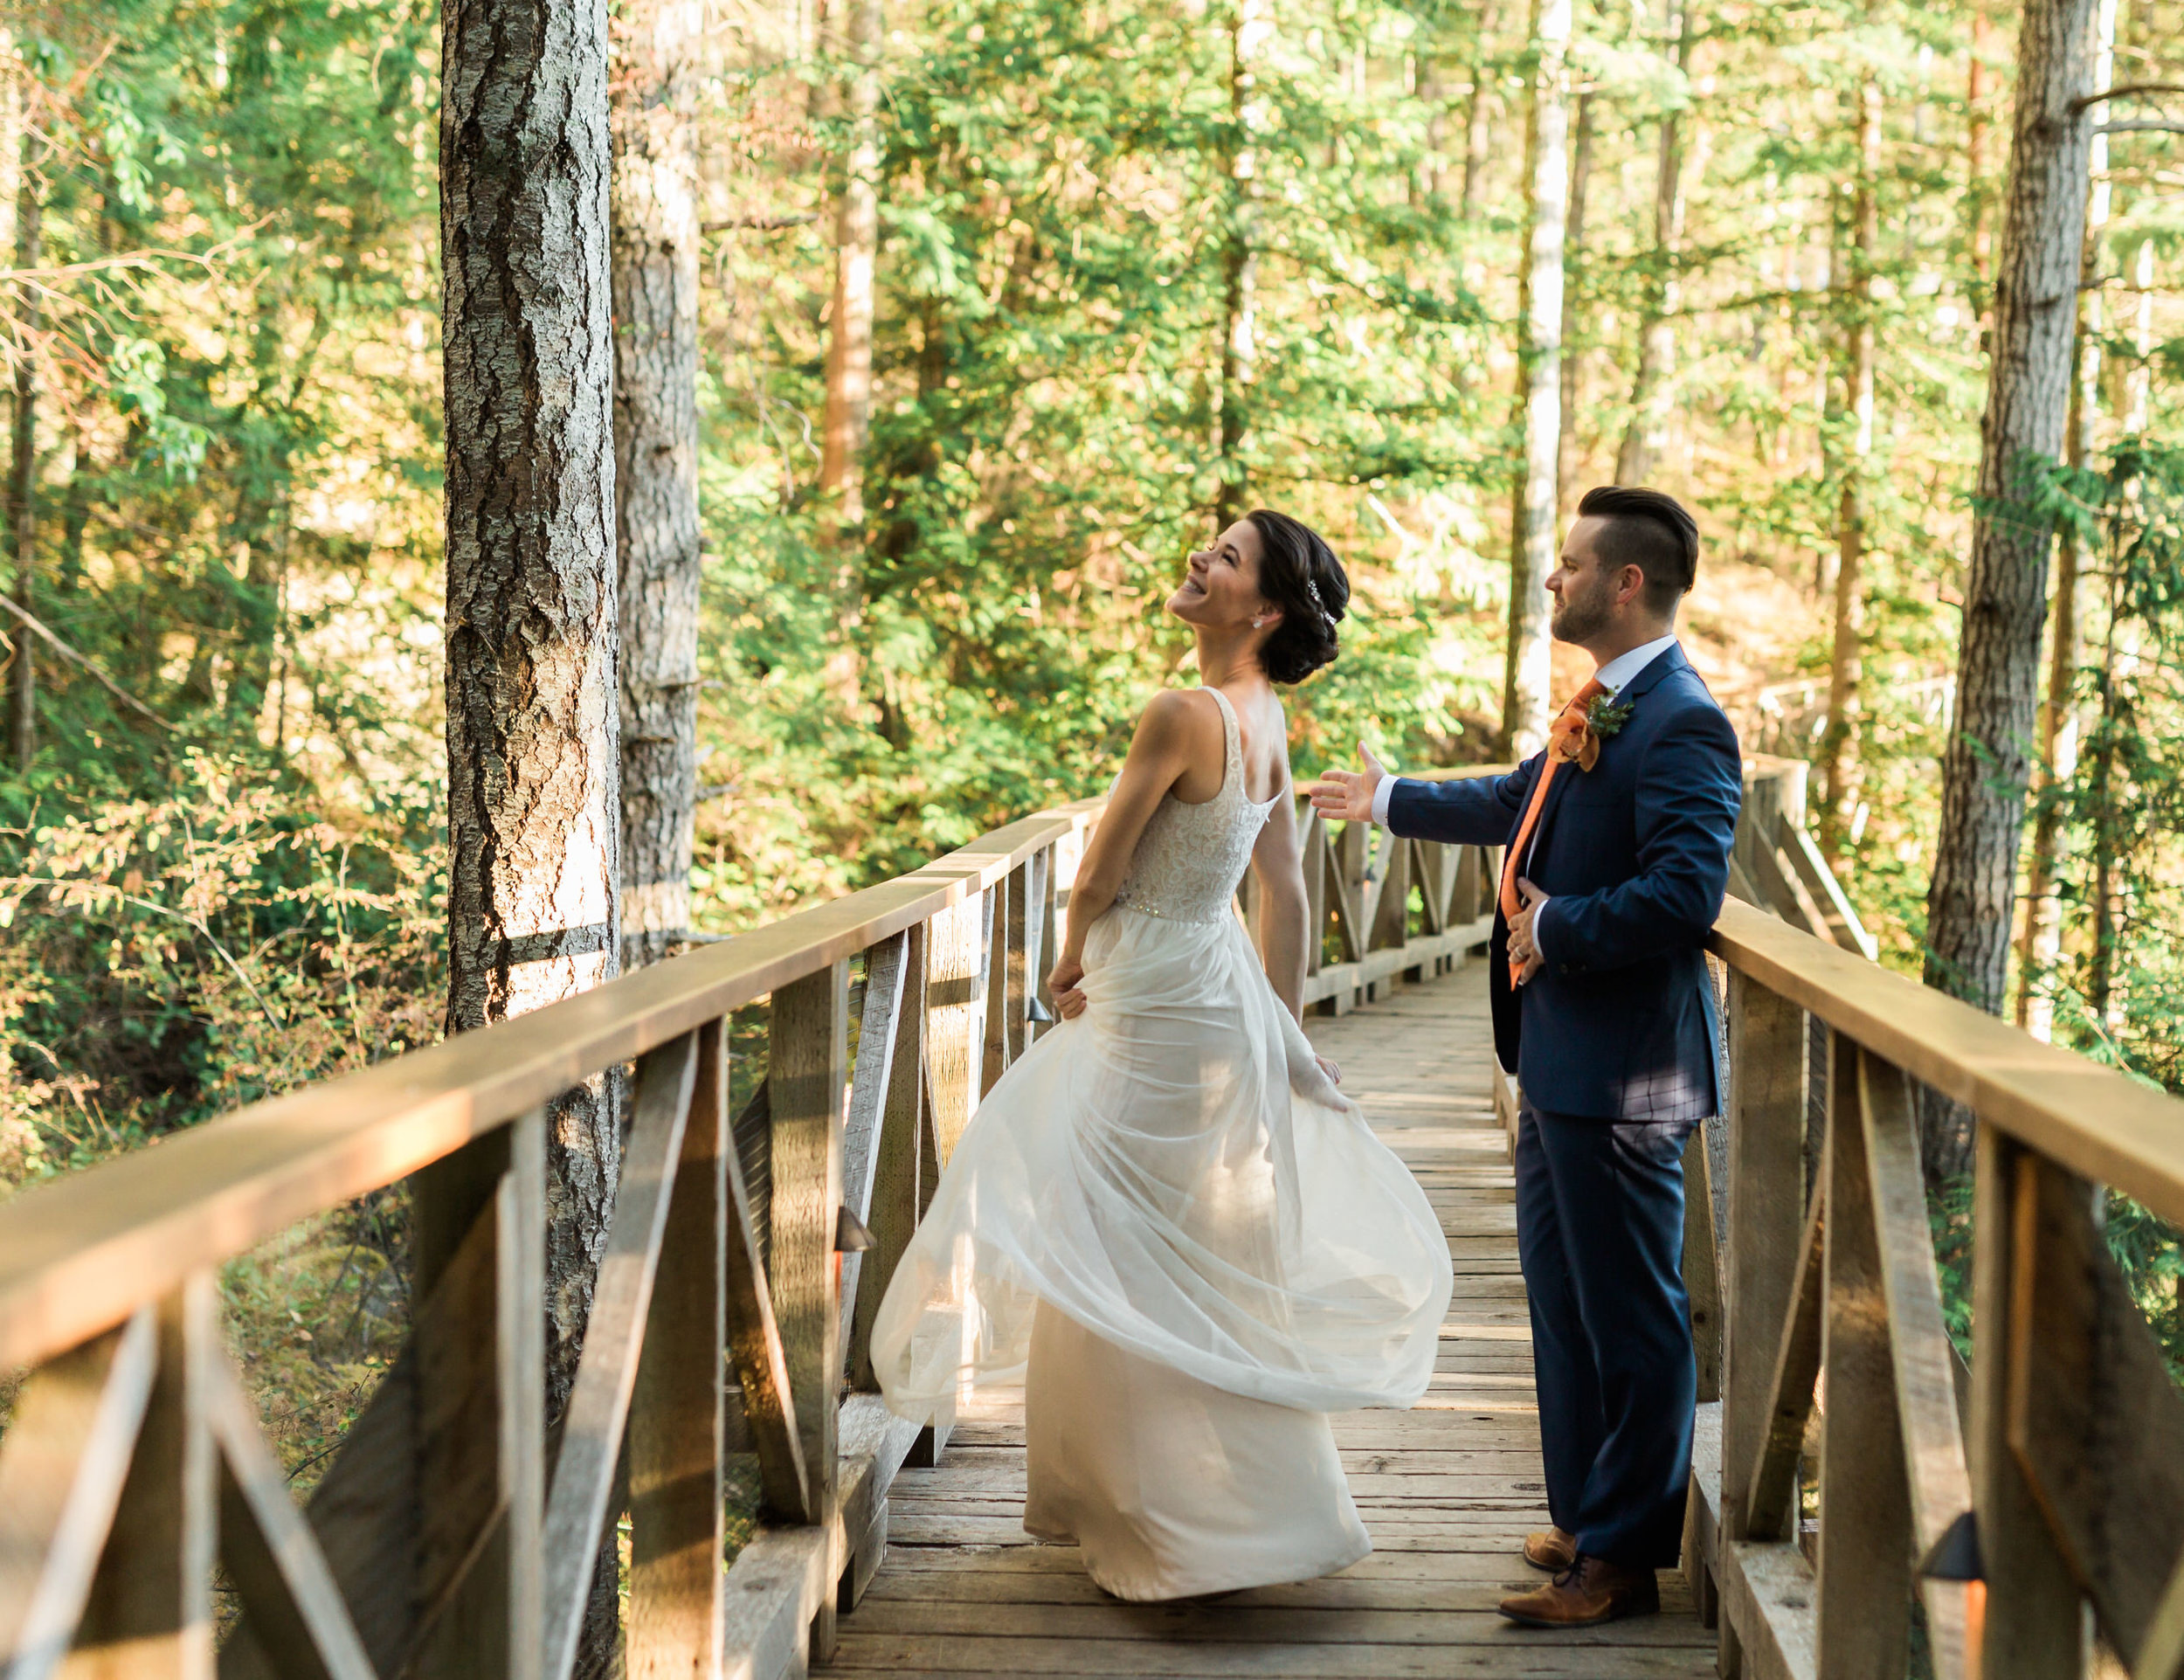 Rockwater Secret Cove Resort Wedding - Sunshine Coast BC Wedding Photographer - Vancouver Wedding Photographer - Sunshine Coast Elopement Photos - IMG_0958.jpg